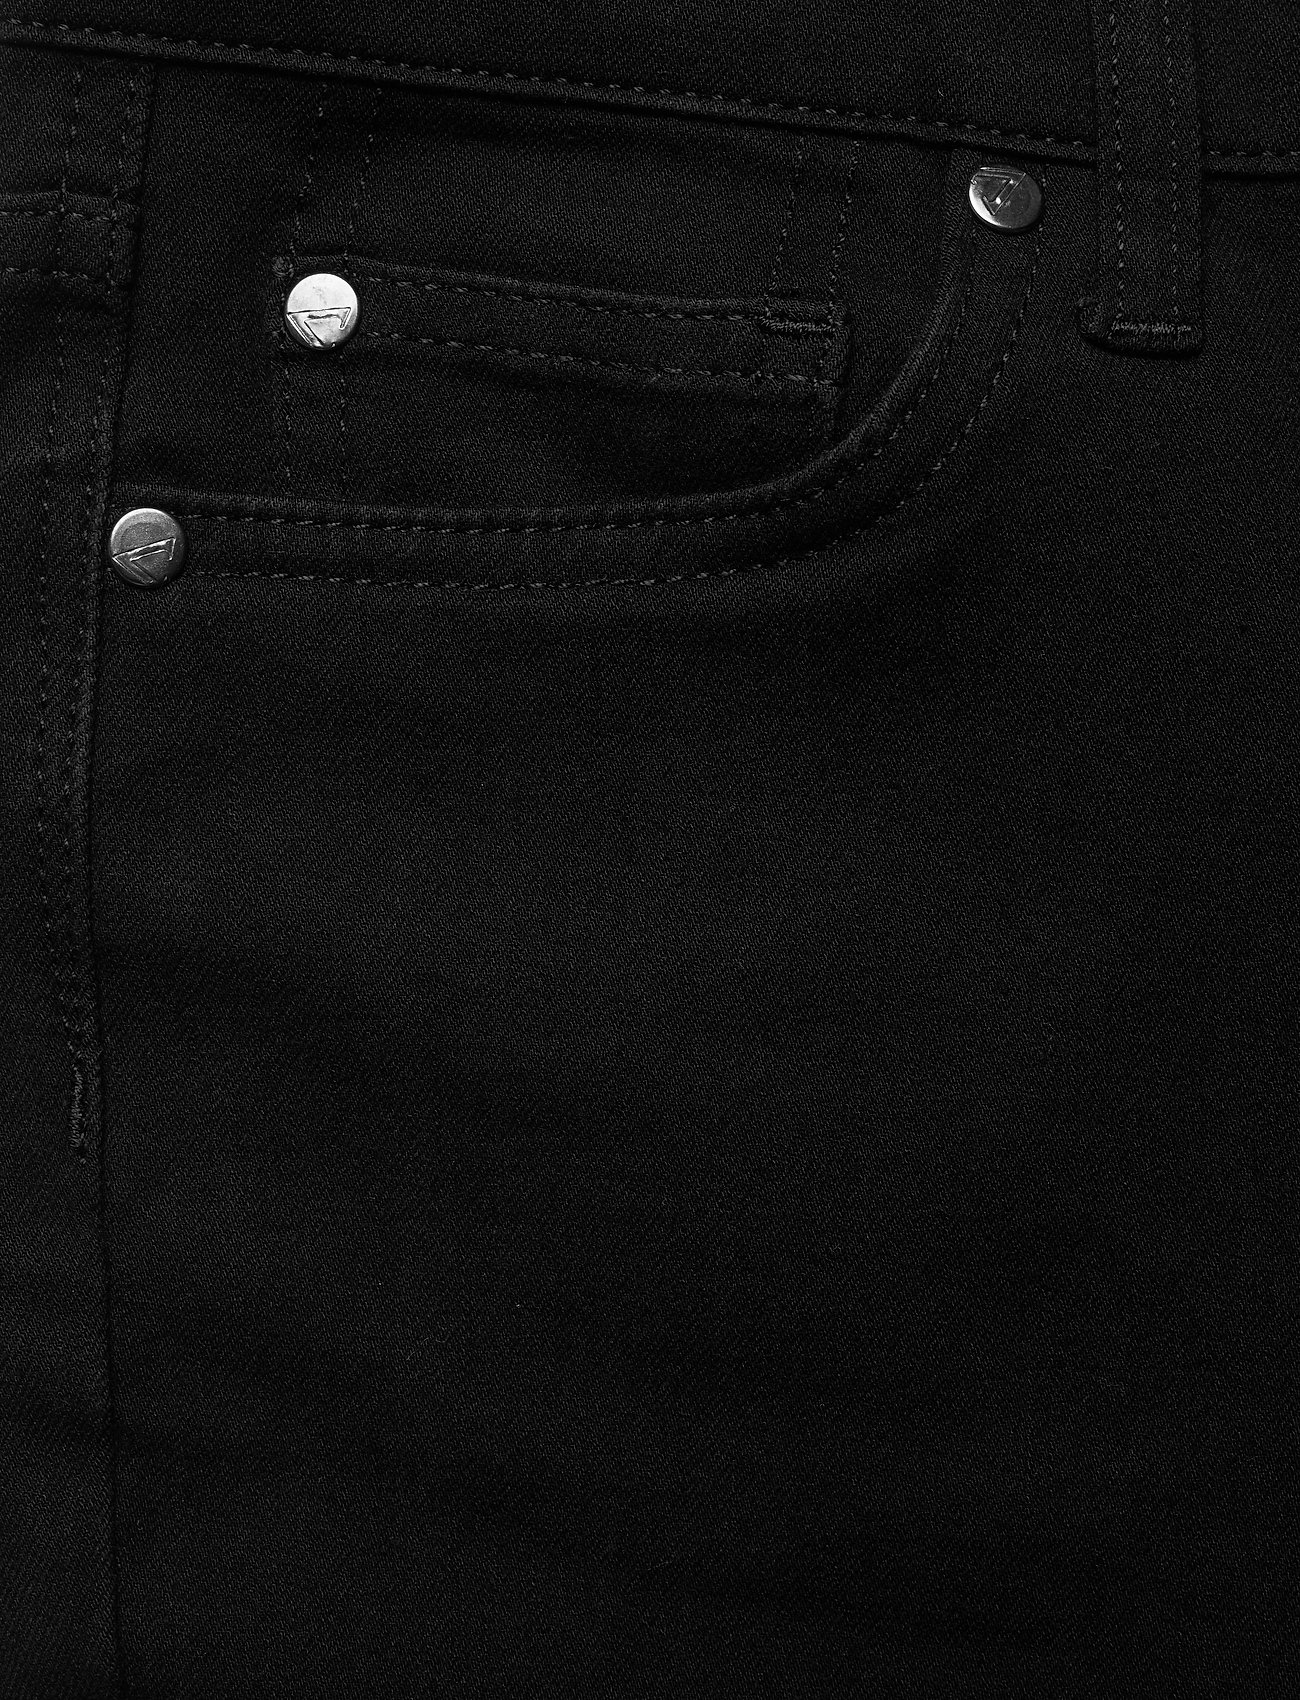 FIVEUNITS Kate 851 - Spodnie BLACK EASE - Kobiety Odzież.